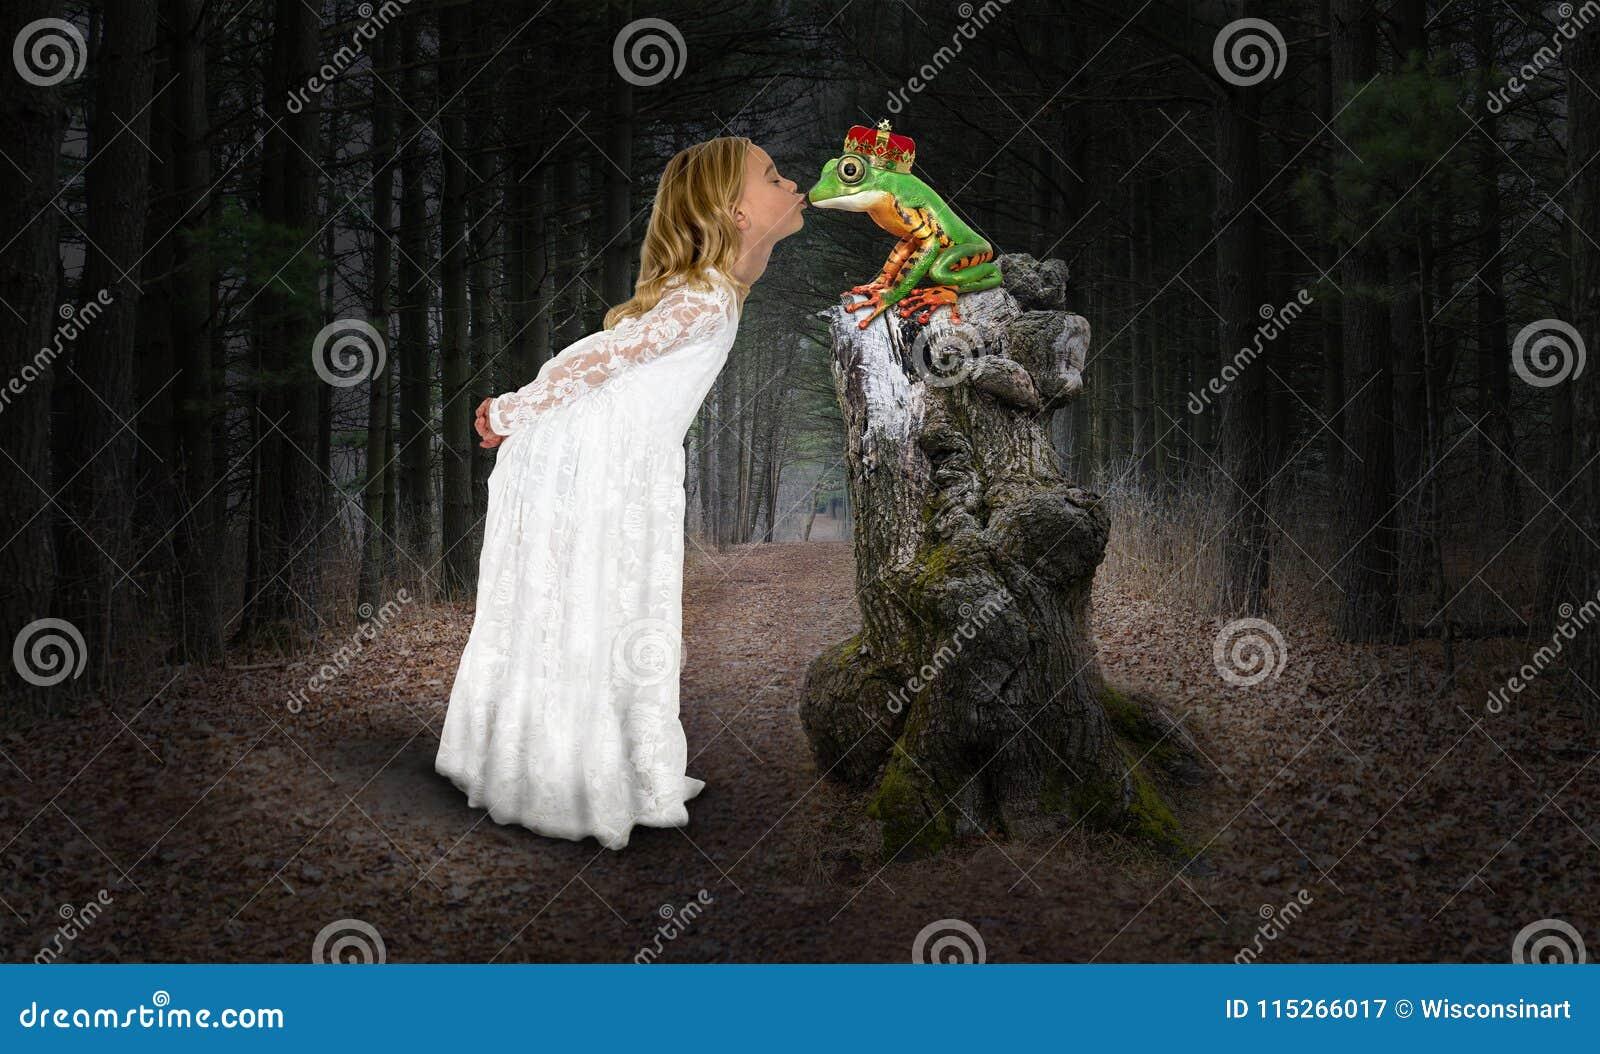 Fille, princesse, baiser, embrassant la grenouille, imagination